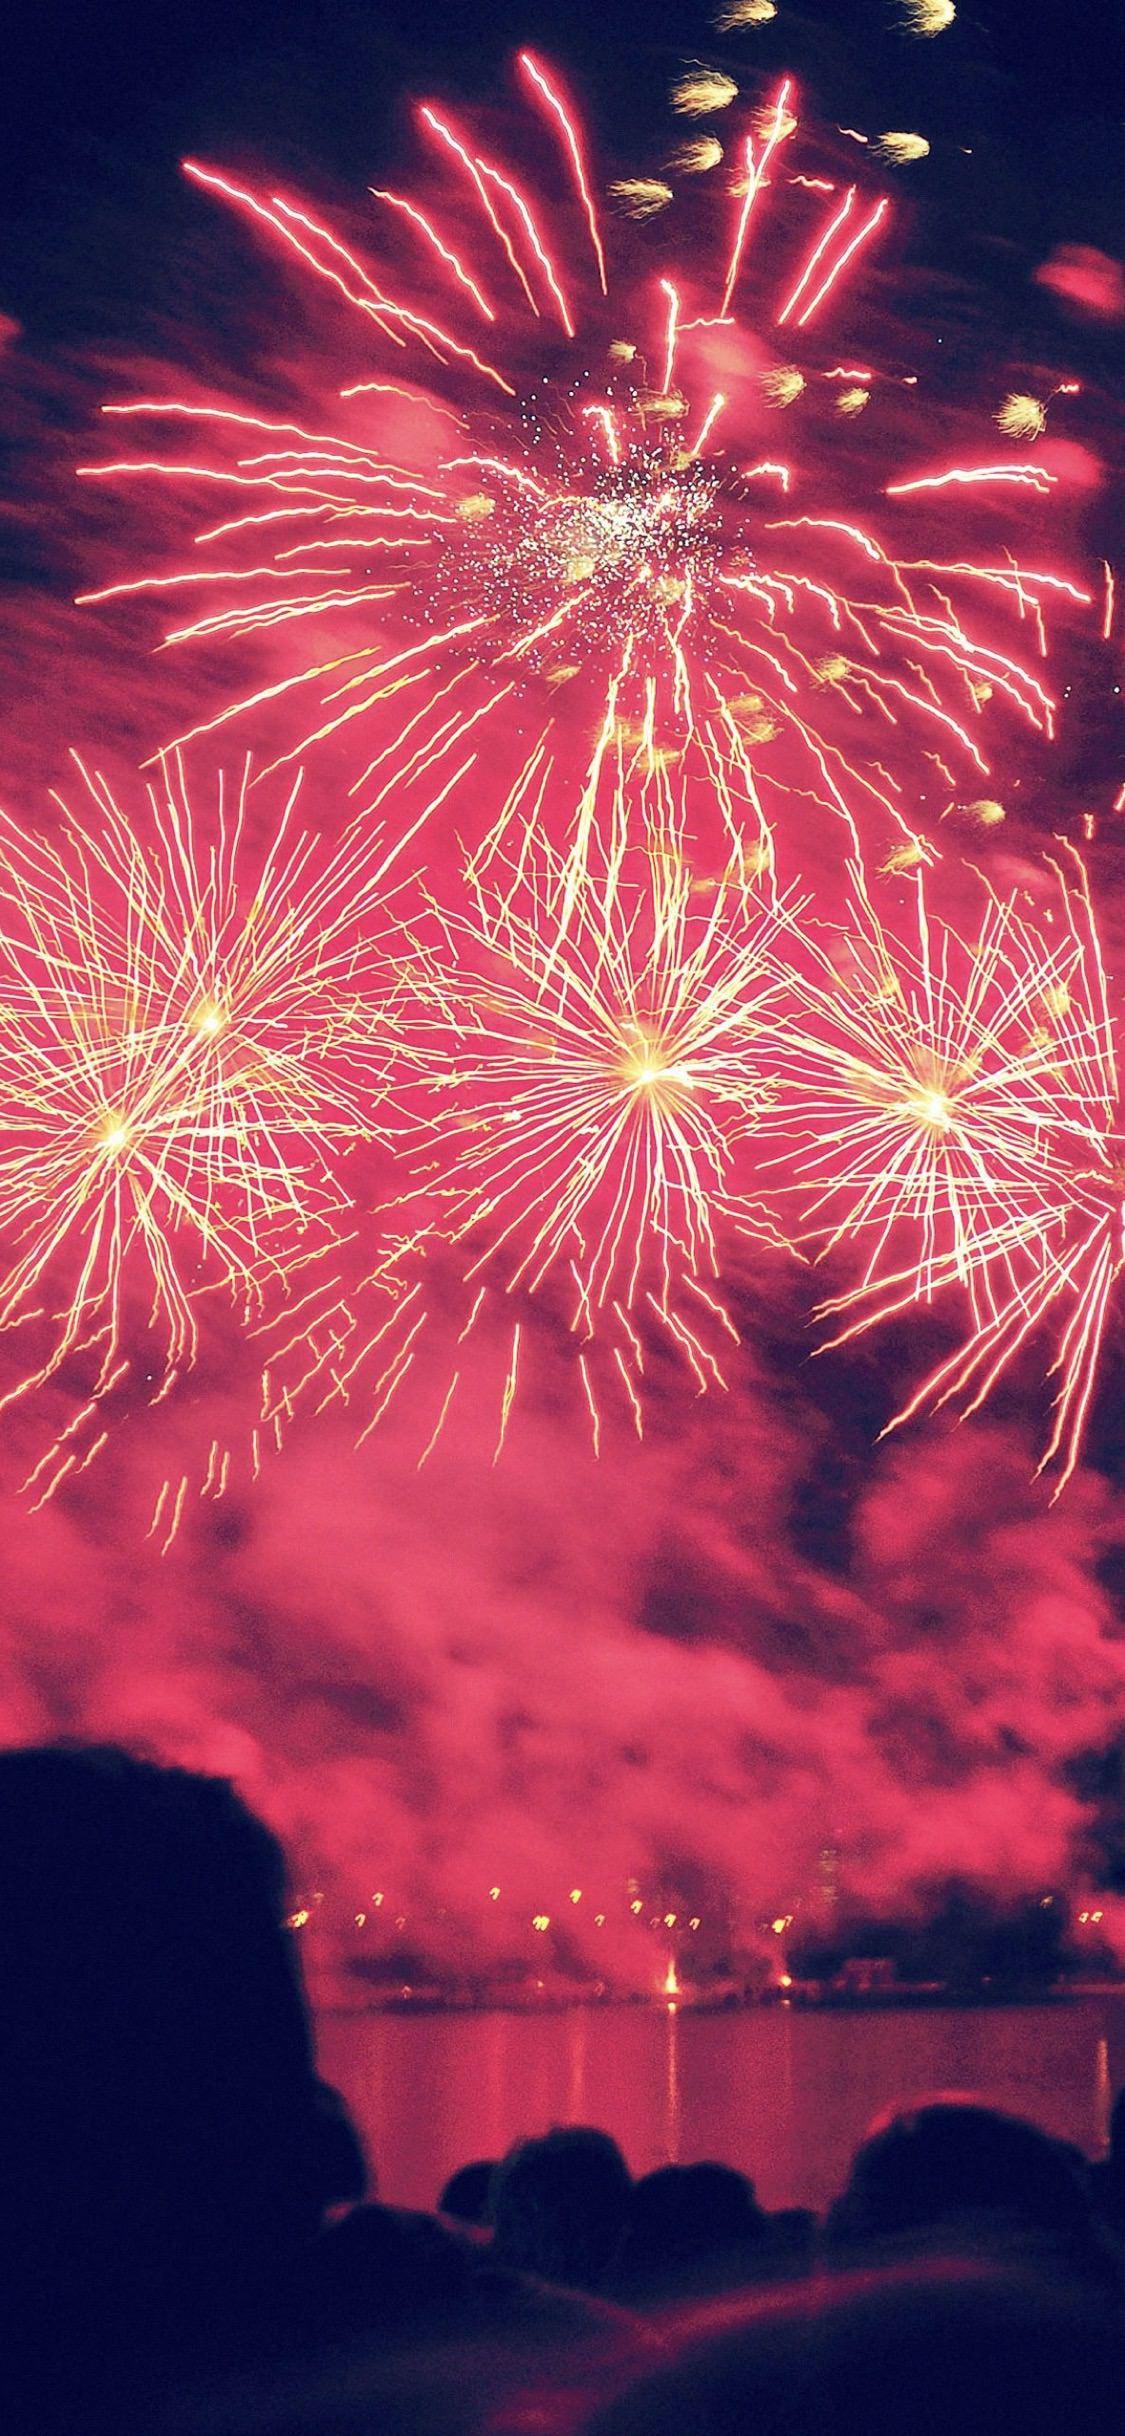 Pemandangan Merah Kembang Api Wallpapersc IPhoneX